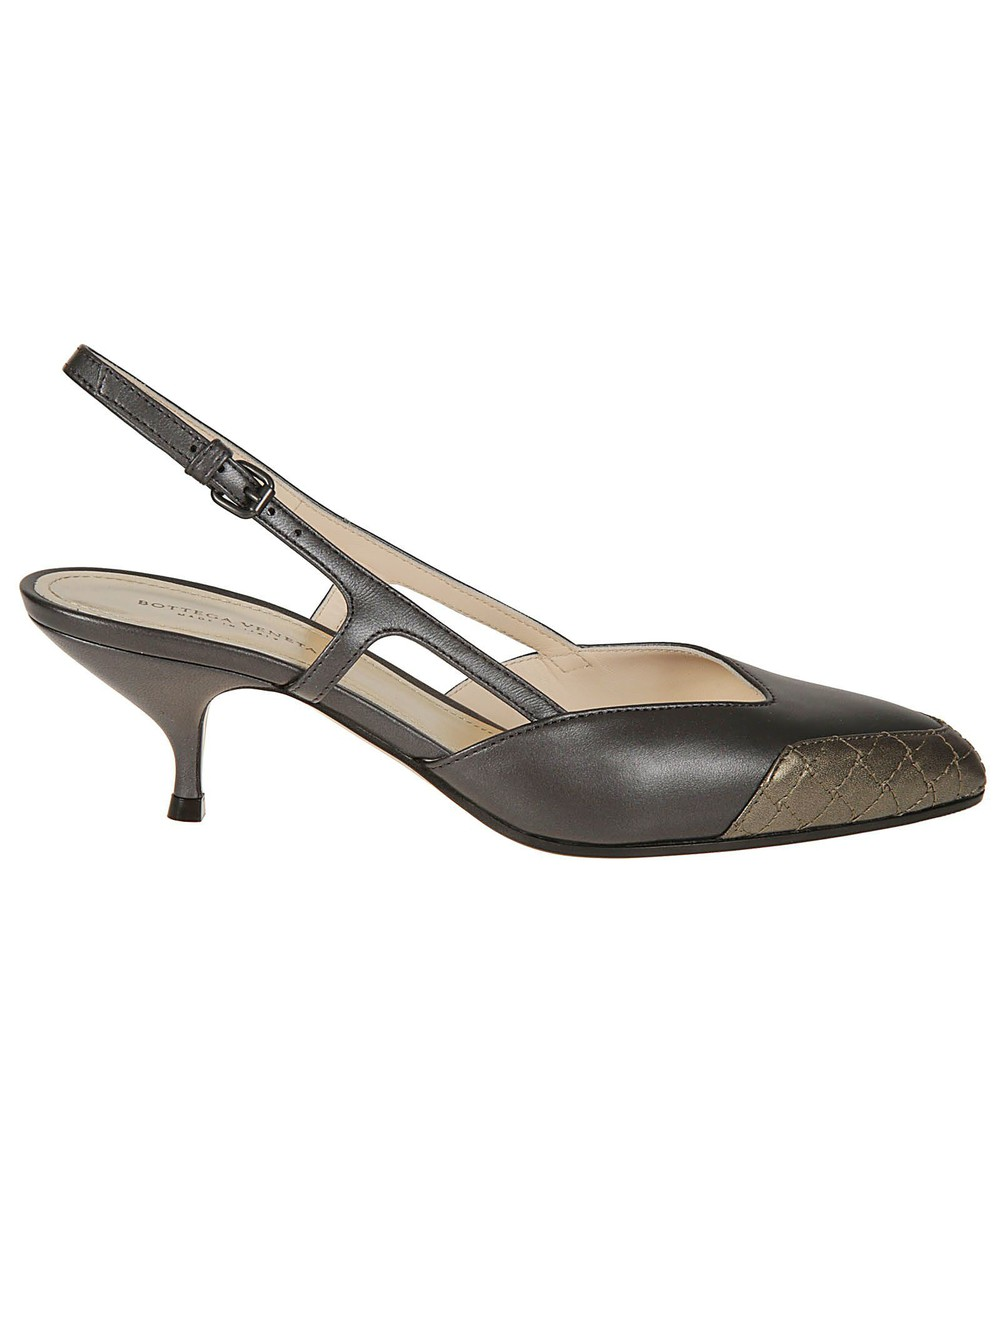 Bottega Veneta Asymmetric Sandals in silver